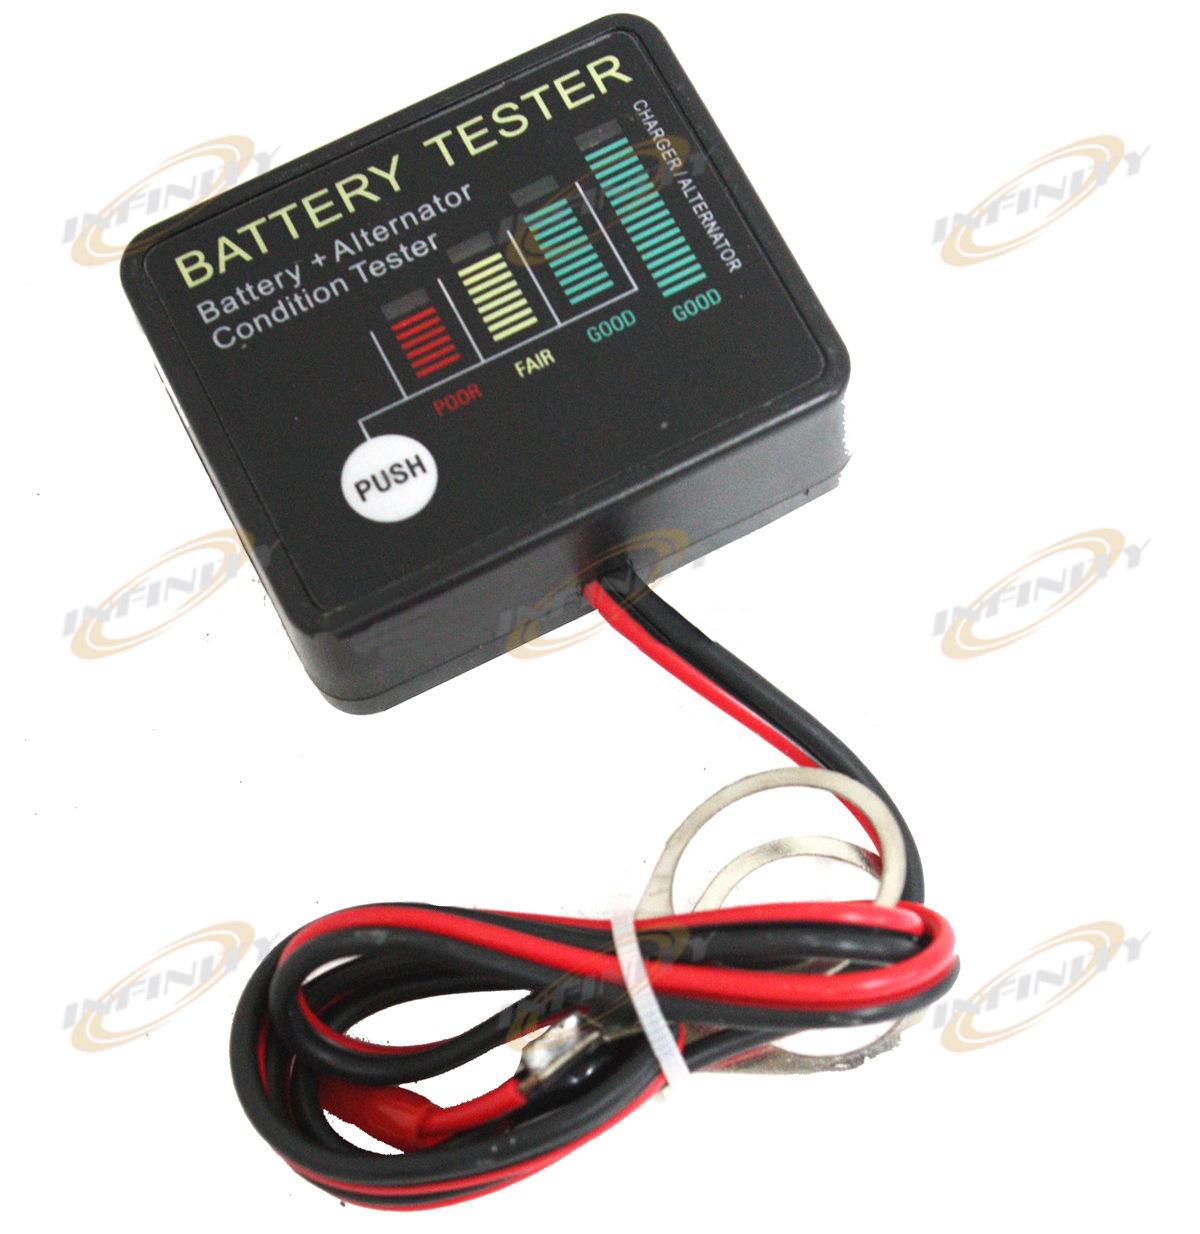 Standard Automotive Battery Load Tester : Alternator load tester volt auto onboard battery with